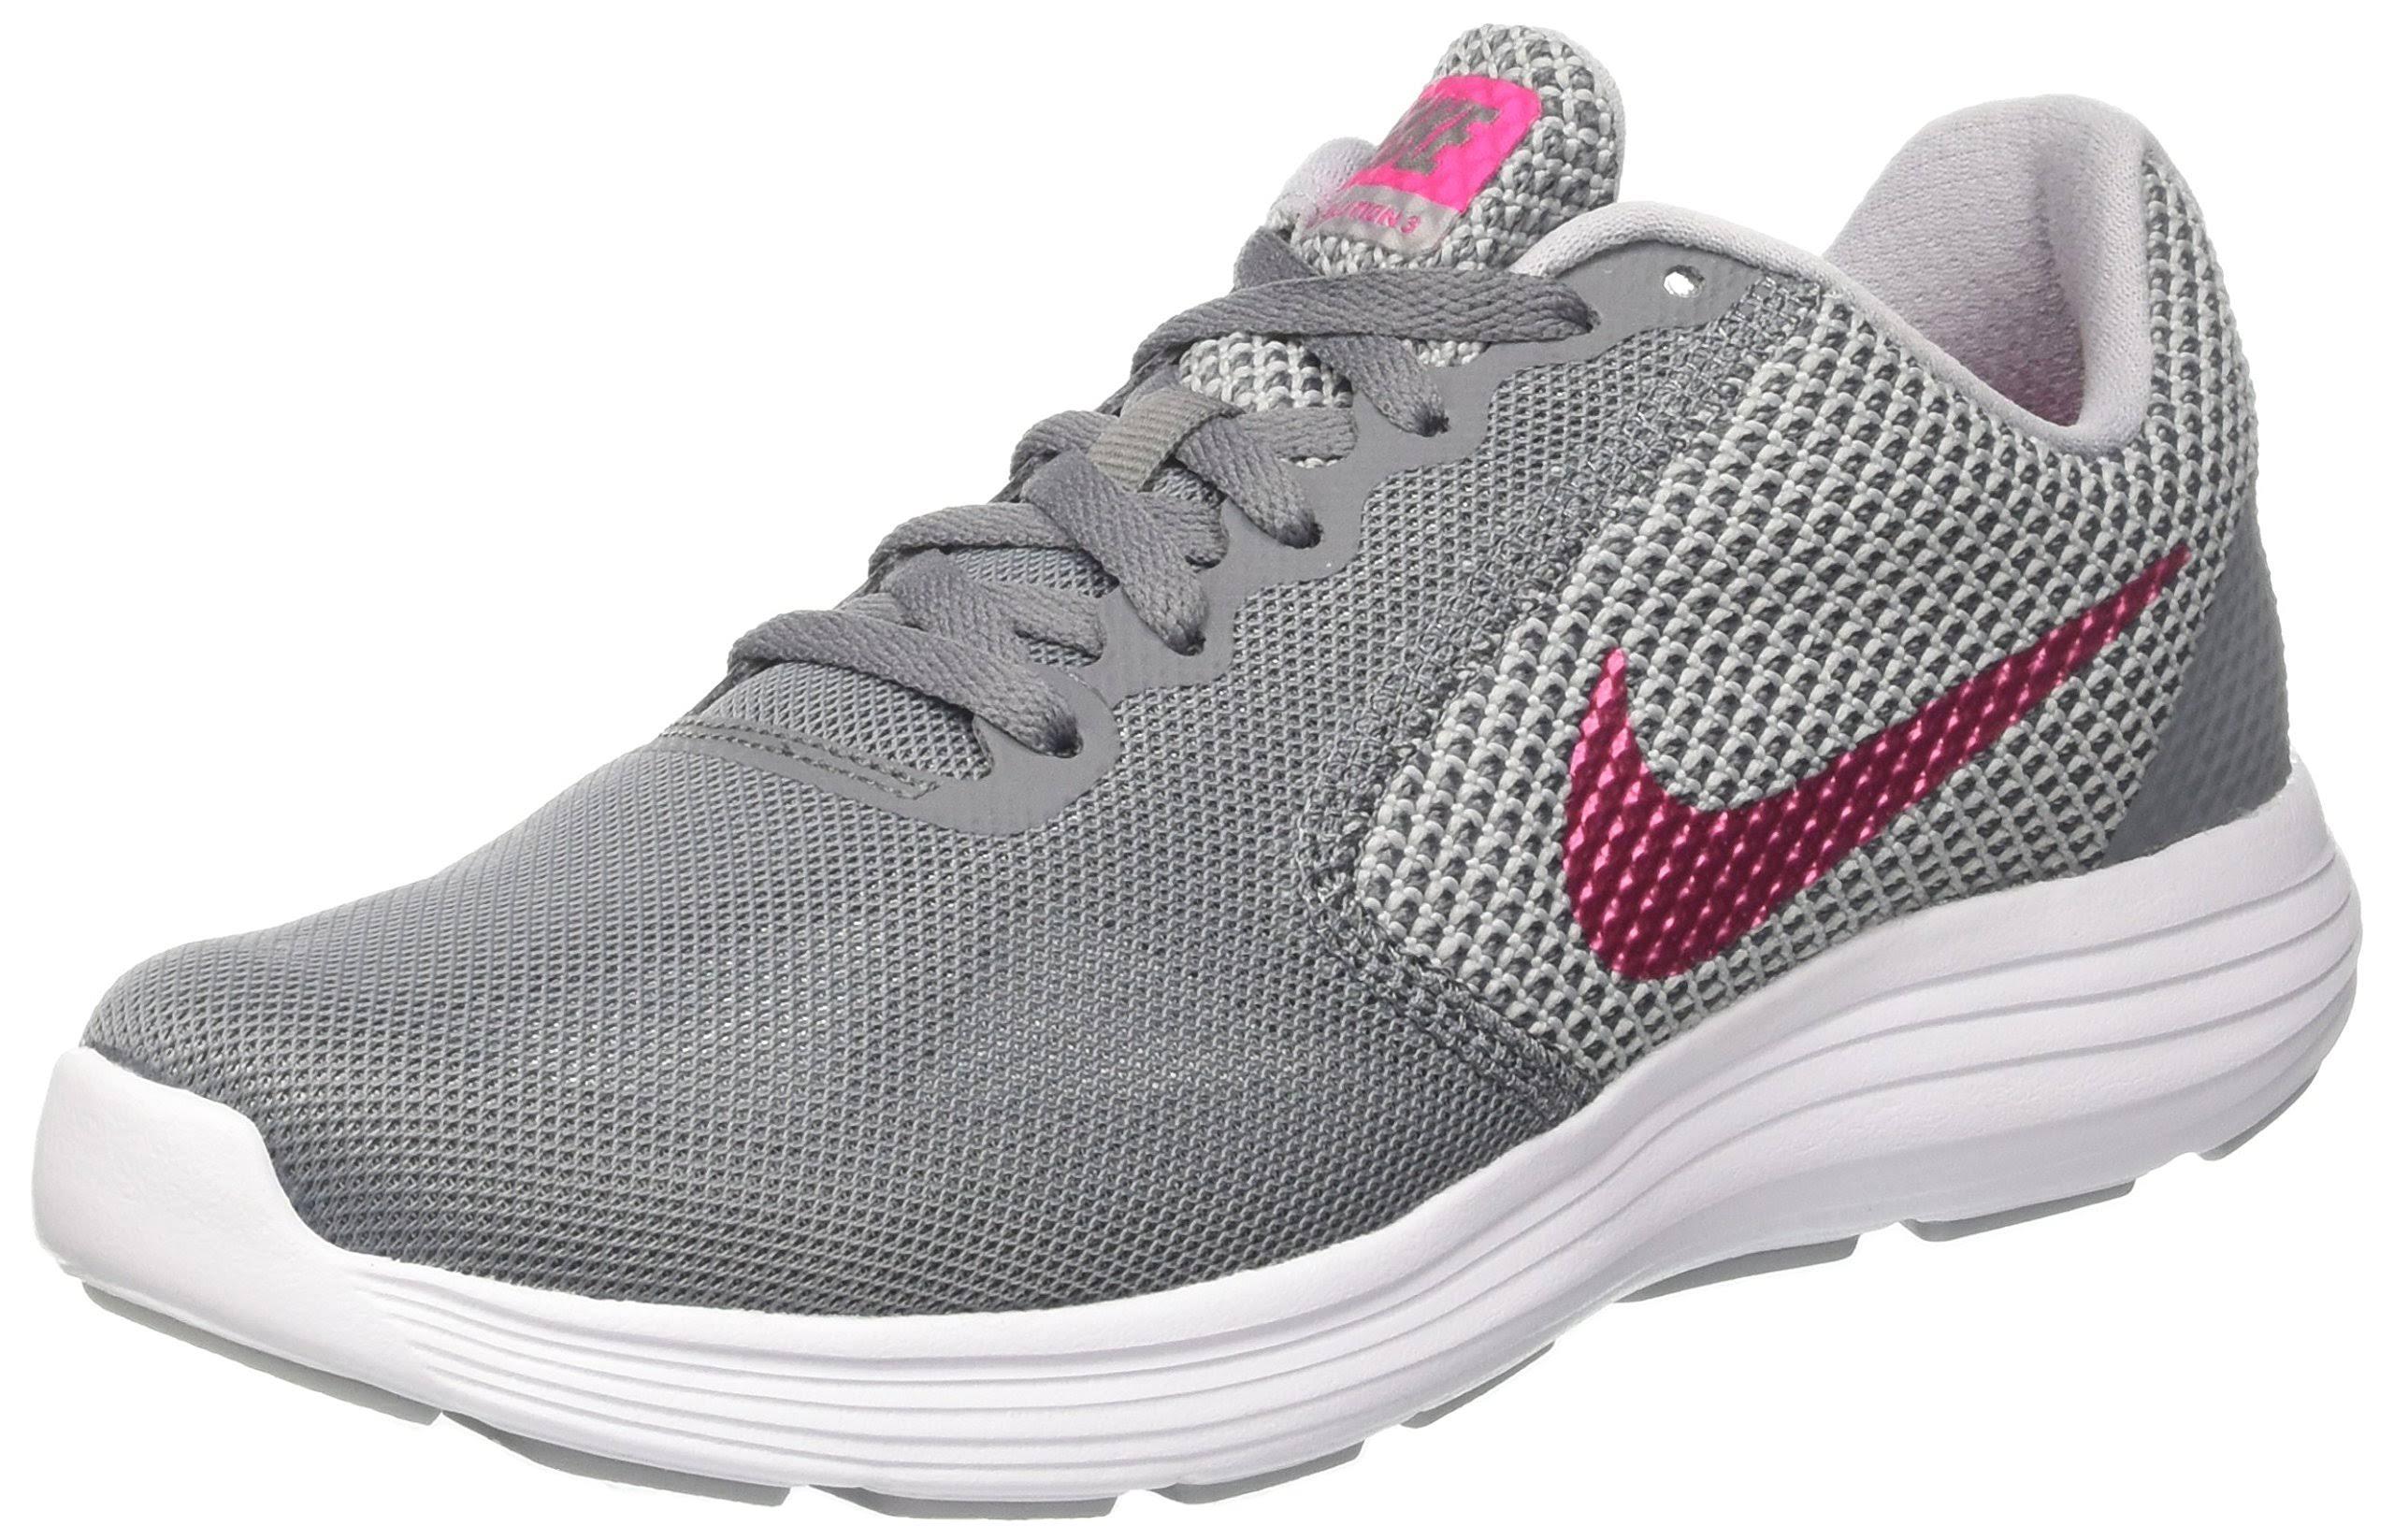 Nike Nike 3grijsroze Womens Nike Revolution Revolution 3grijsroze Womens Revolution Womens KTFJlc31